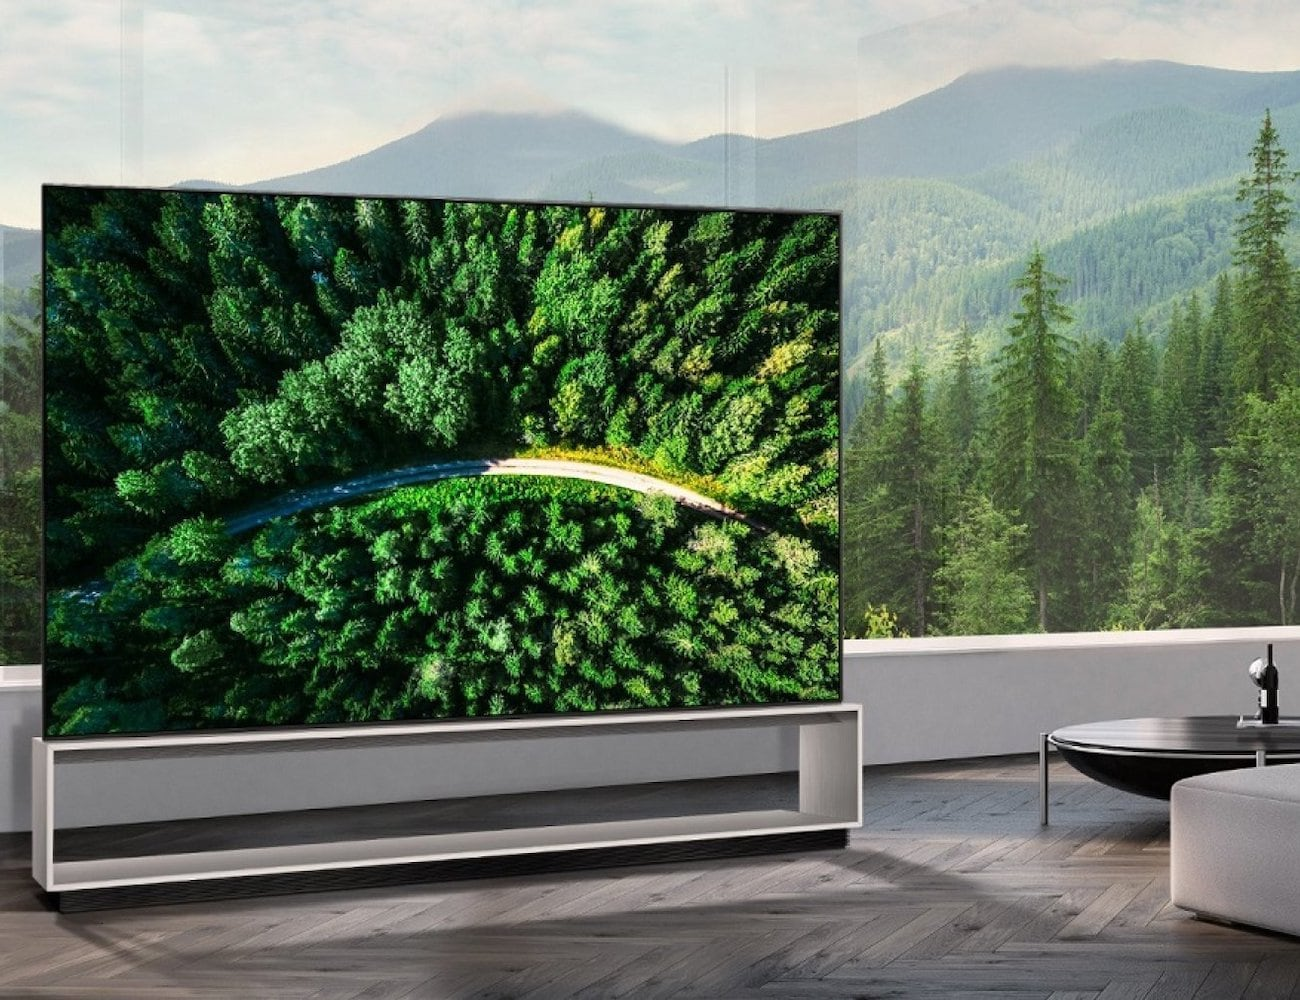 LG Z9 8K Smart OLED TV